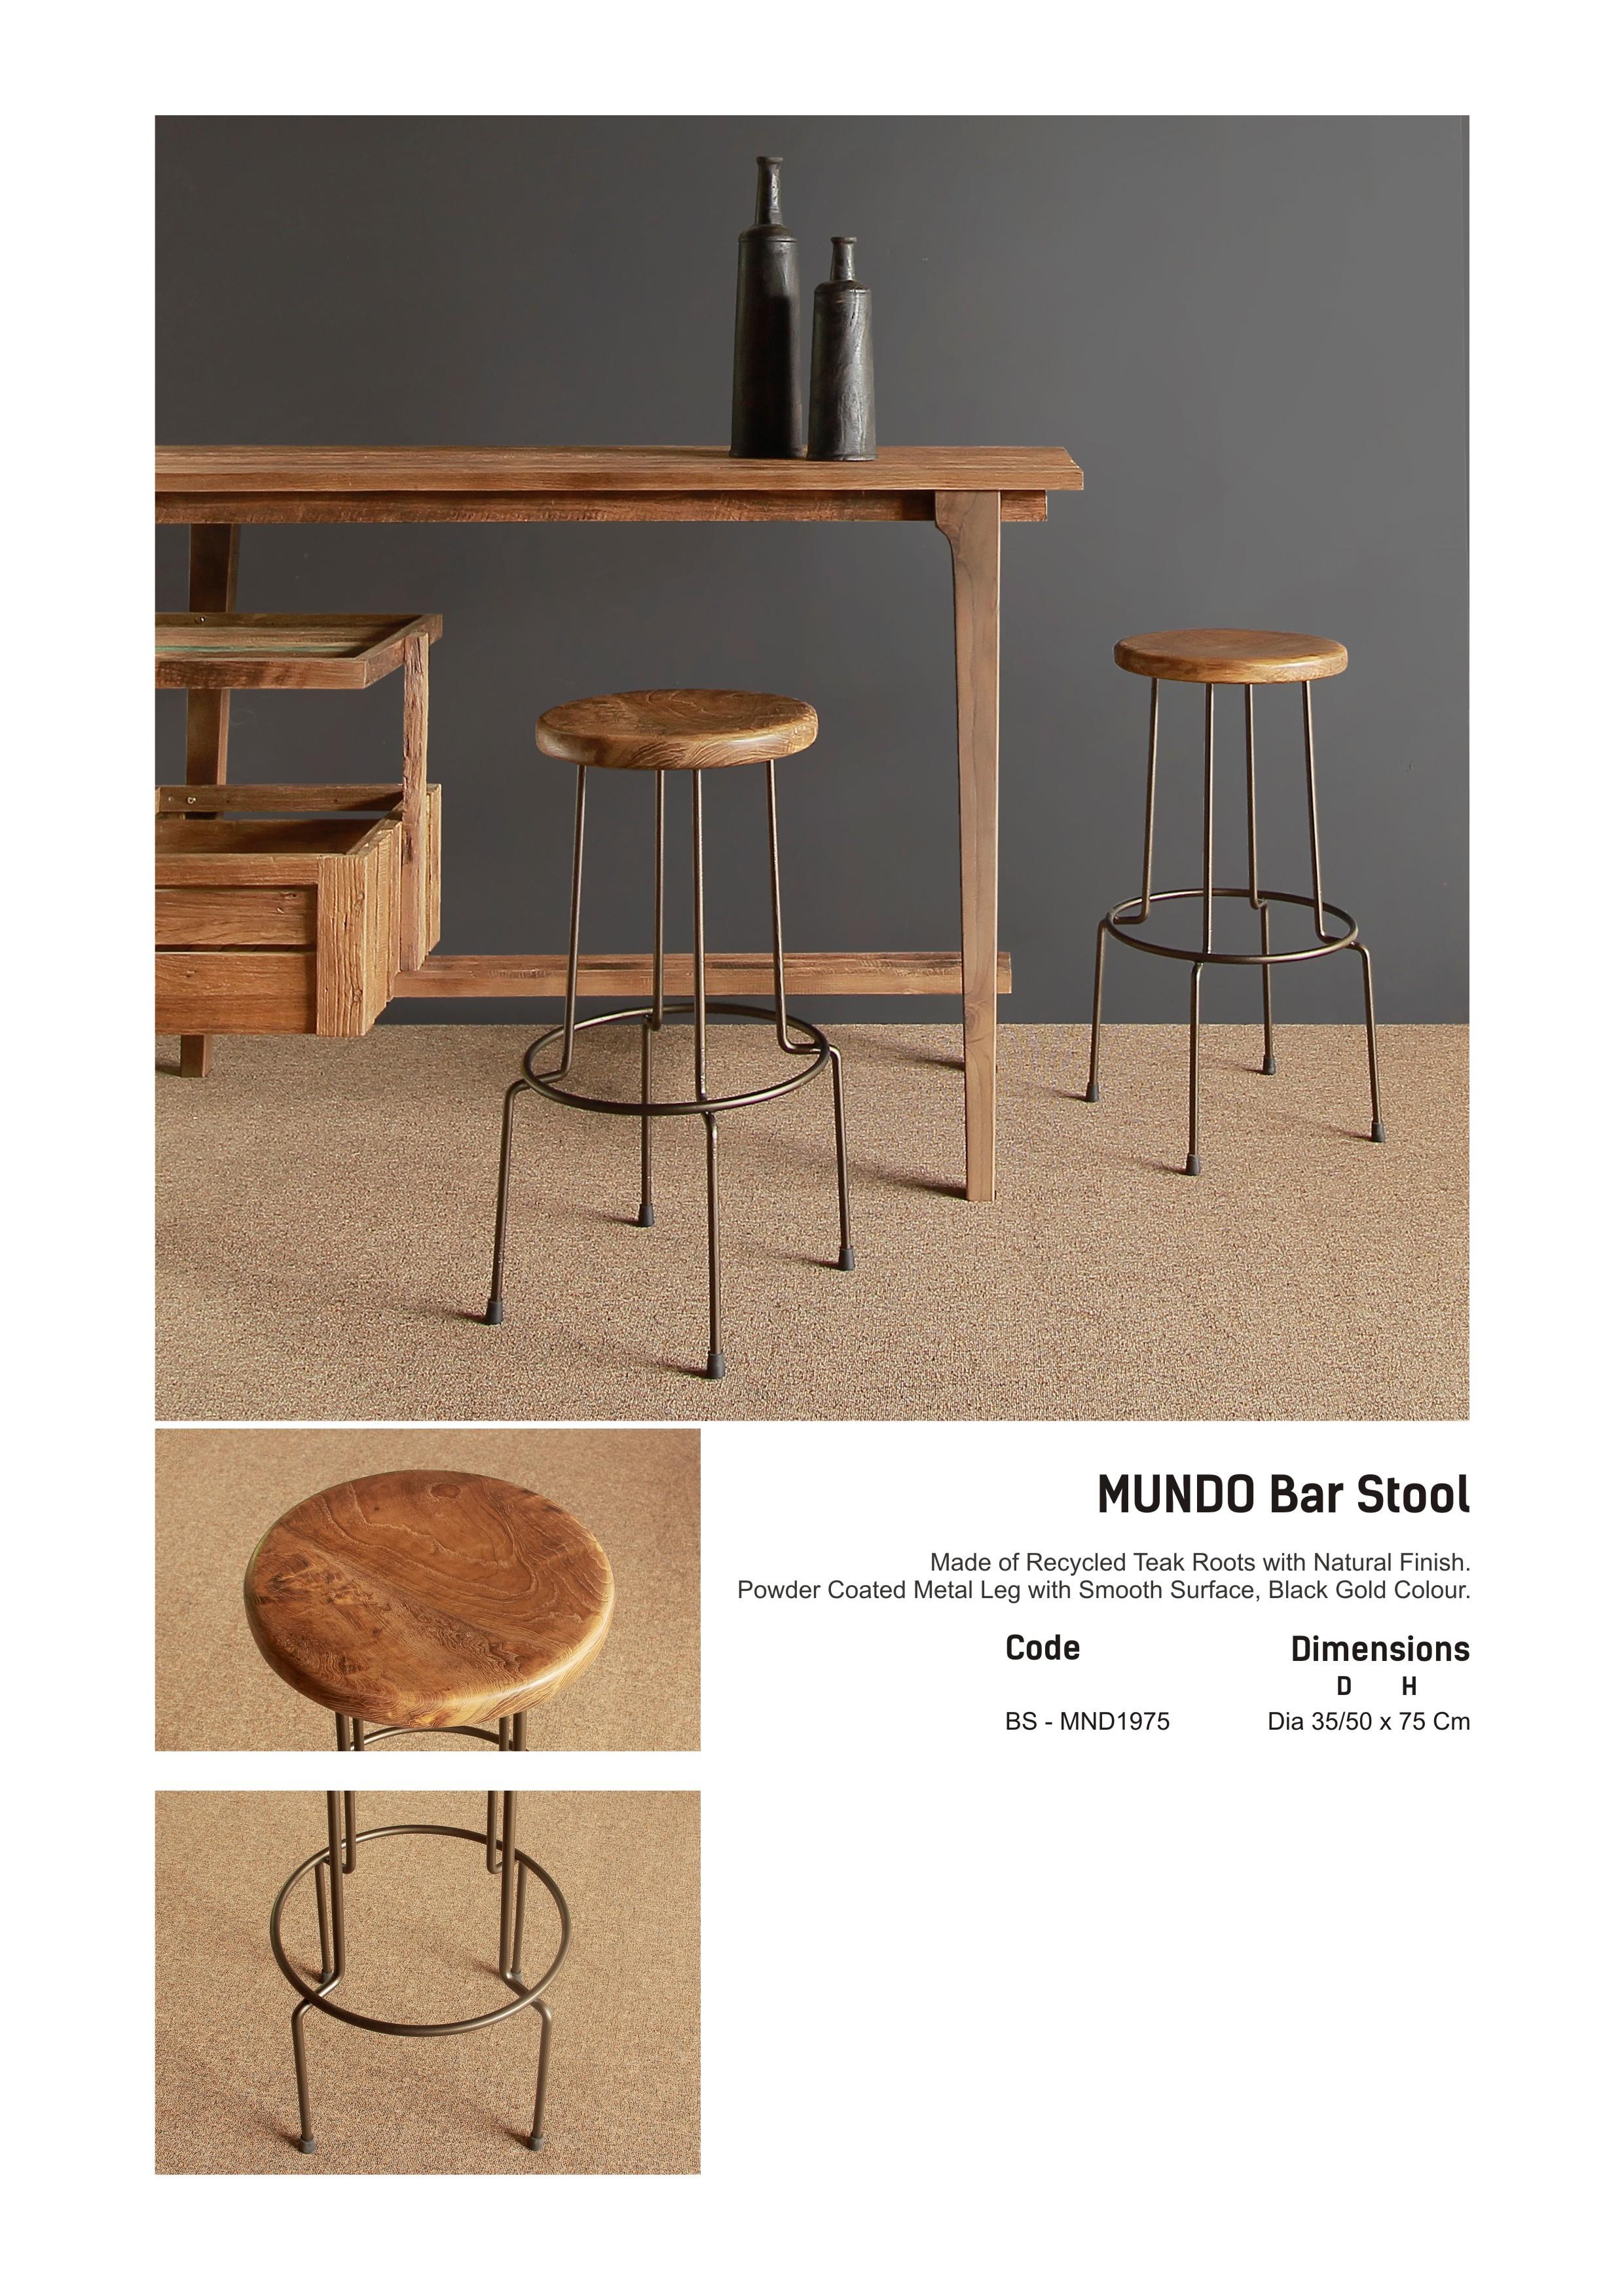 19. MUNDO Bar Stool - Copy